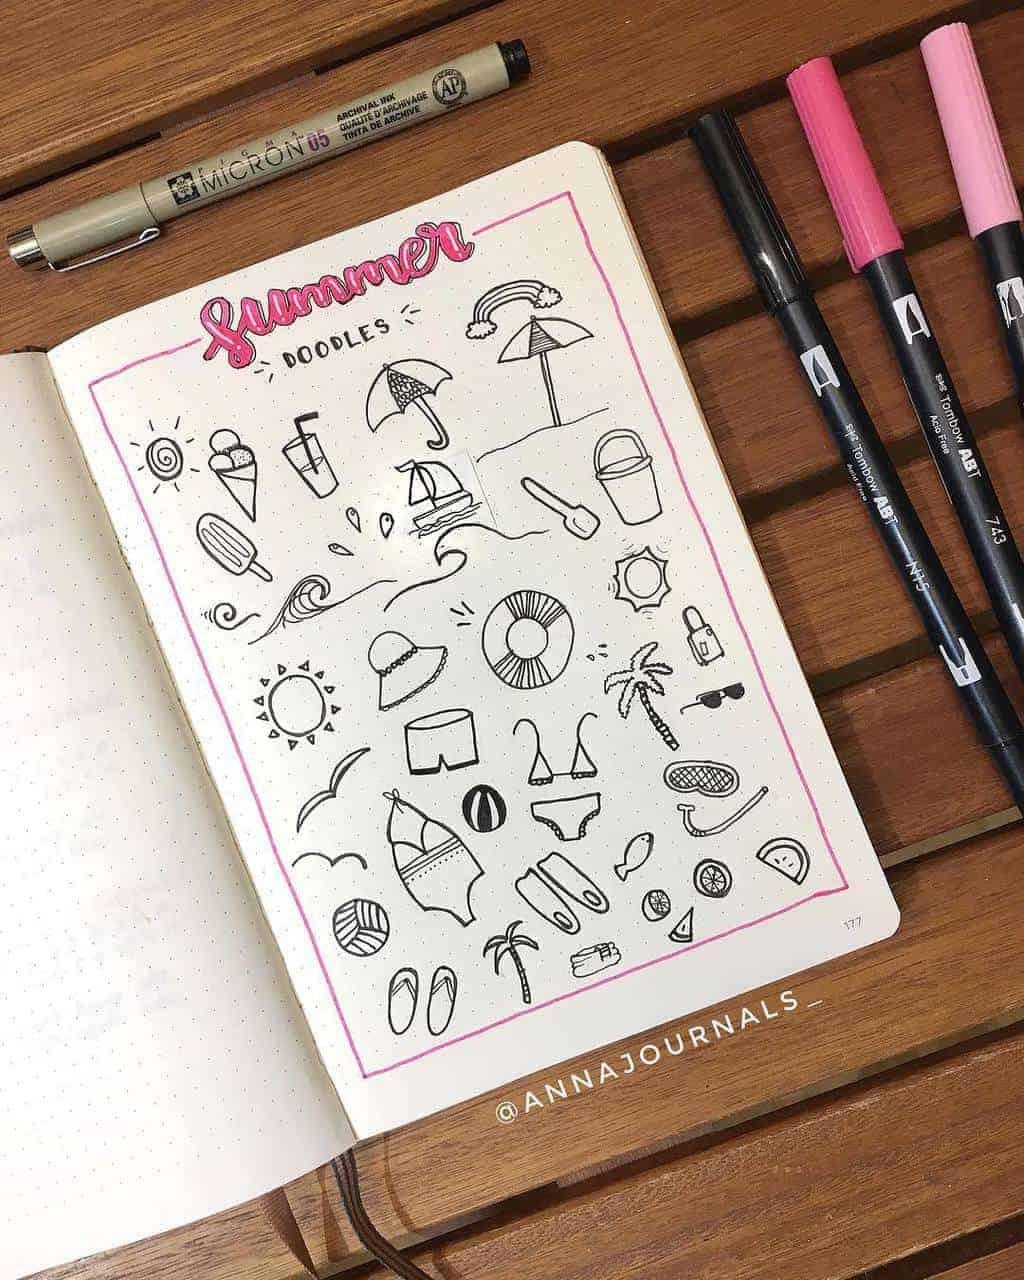 Summer Bullet Journal Doodles by @annajournals | Masha Plans